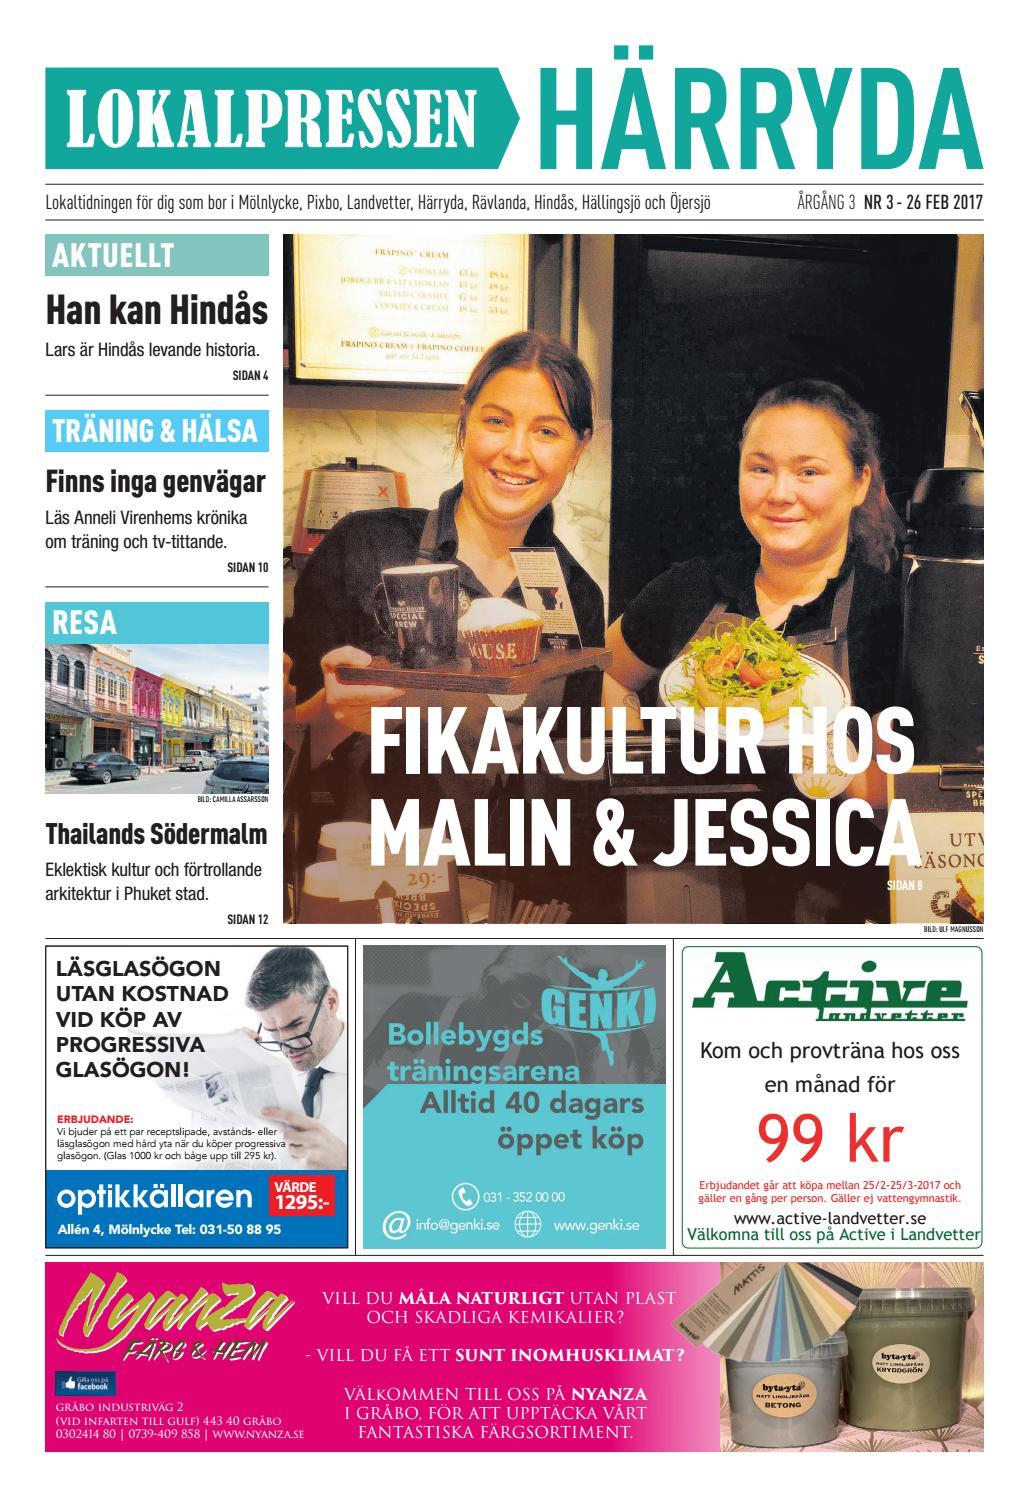 LP Hrryda nr 11 29 mar unam.net - Lokalpressen